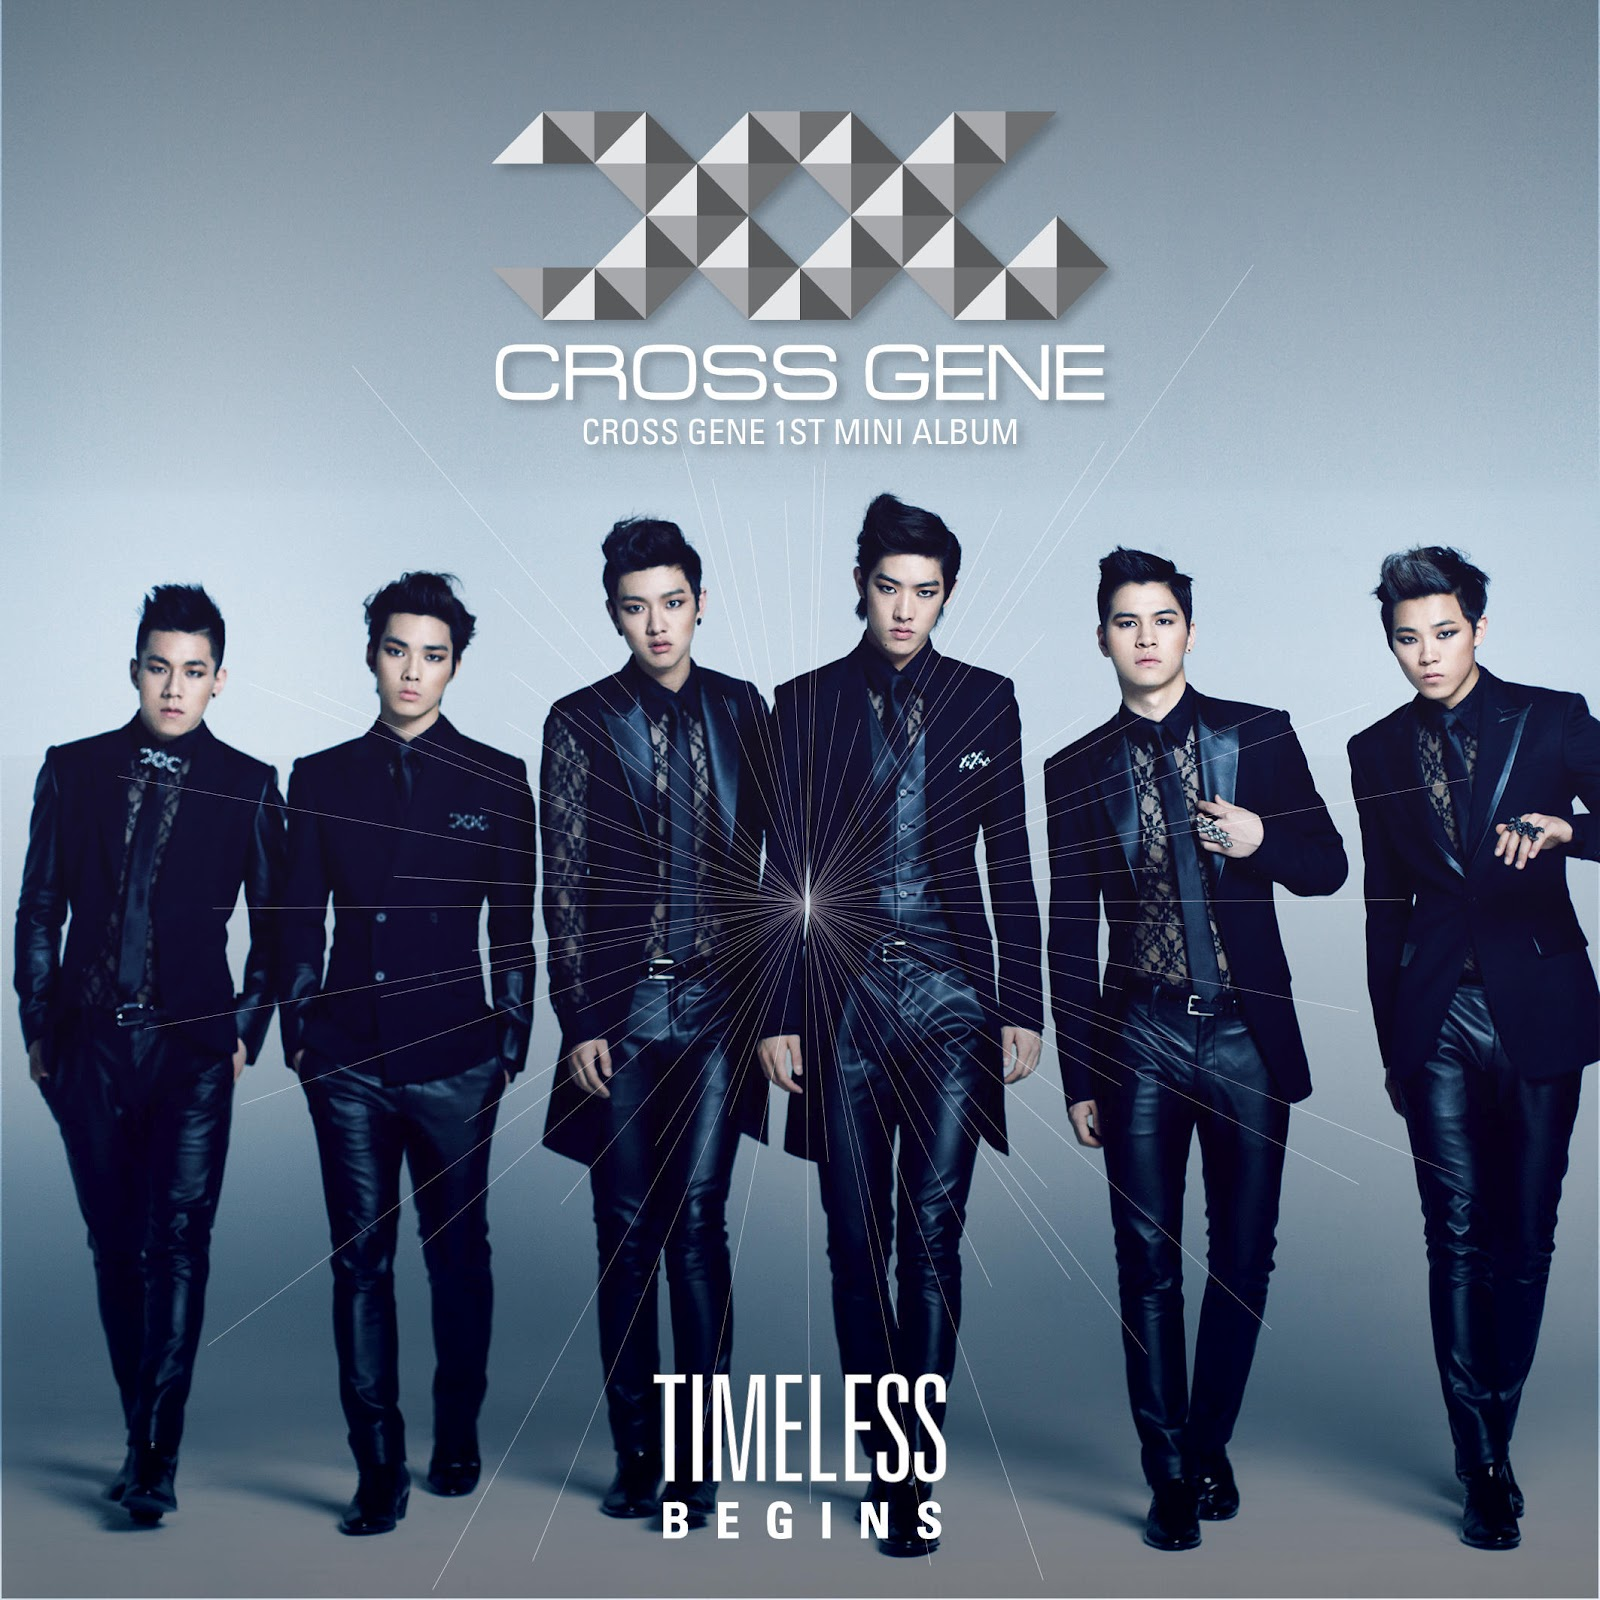 Cross Gene Members